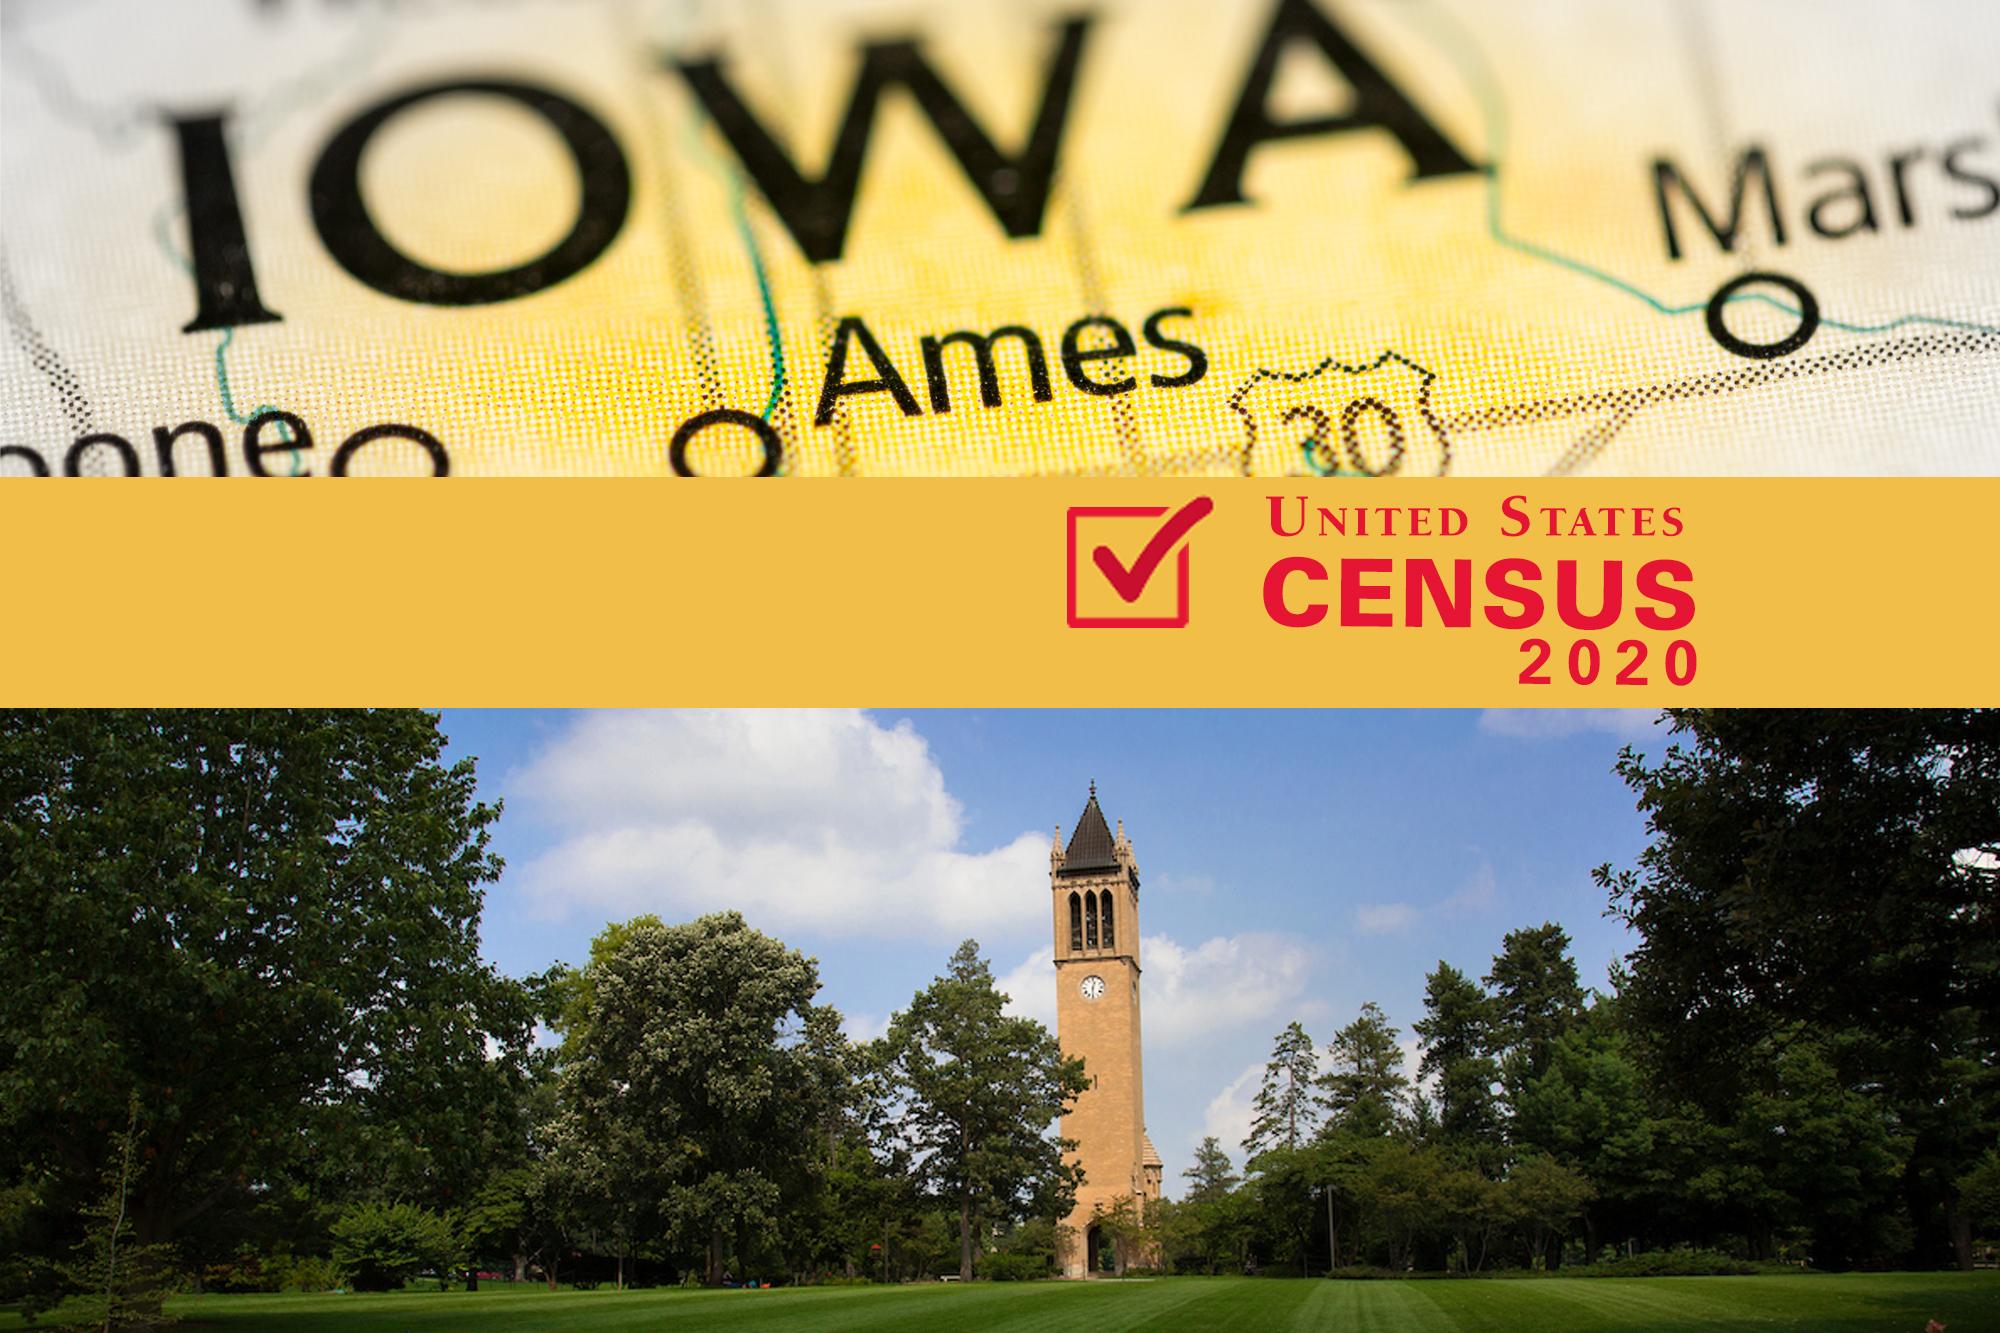 Graphic of Iowa State, Ames, U.S. Census